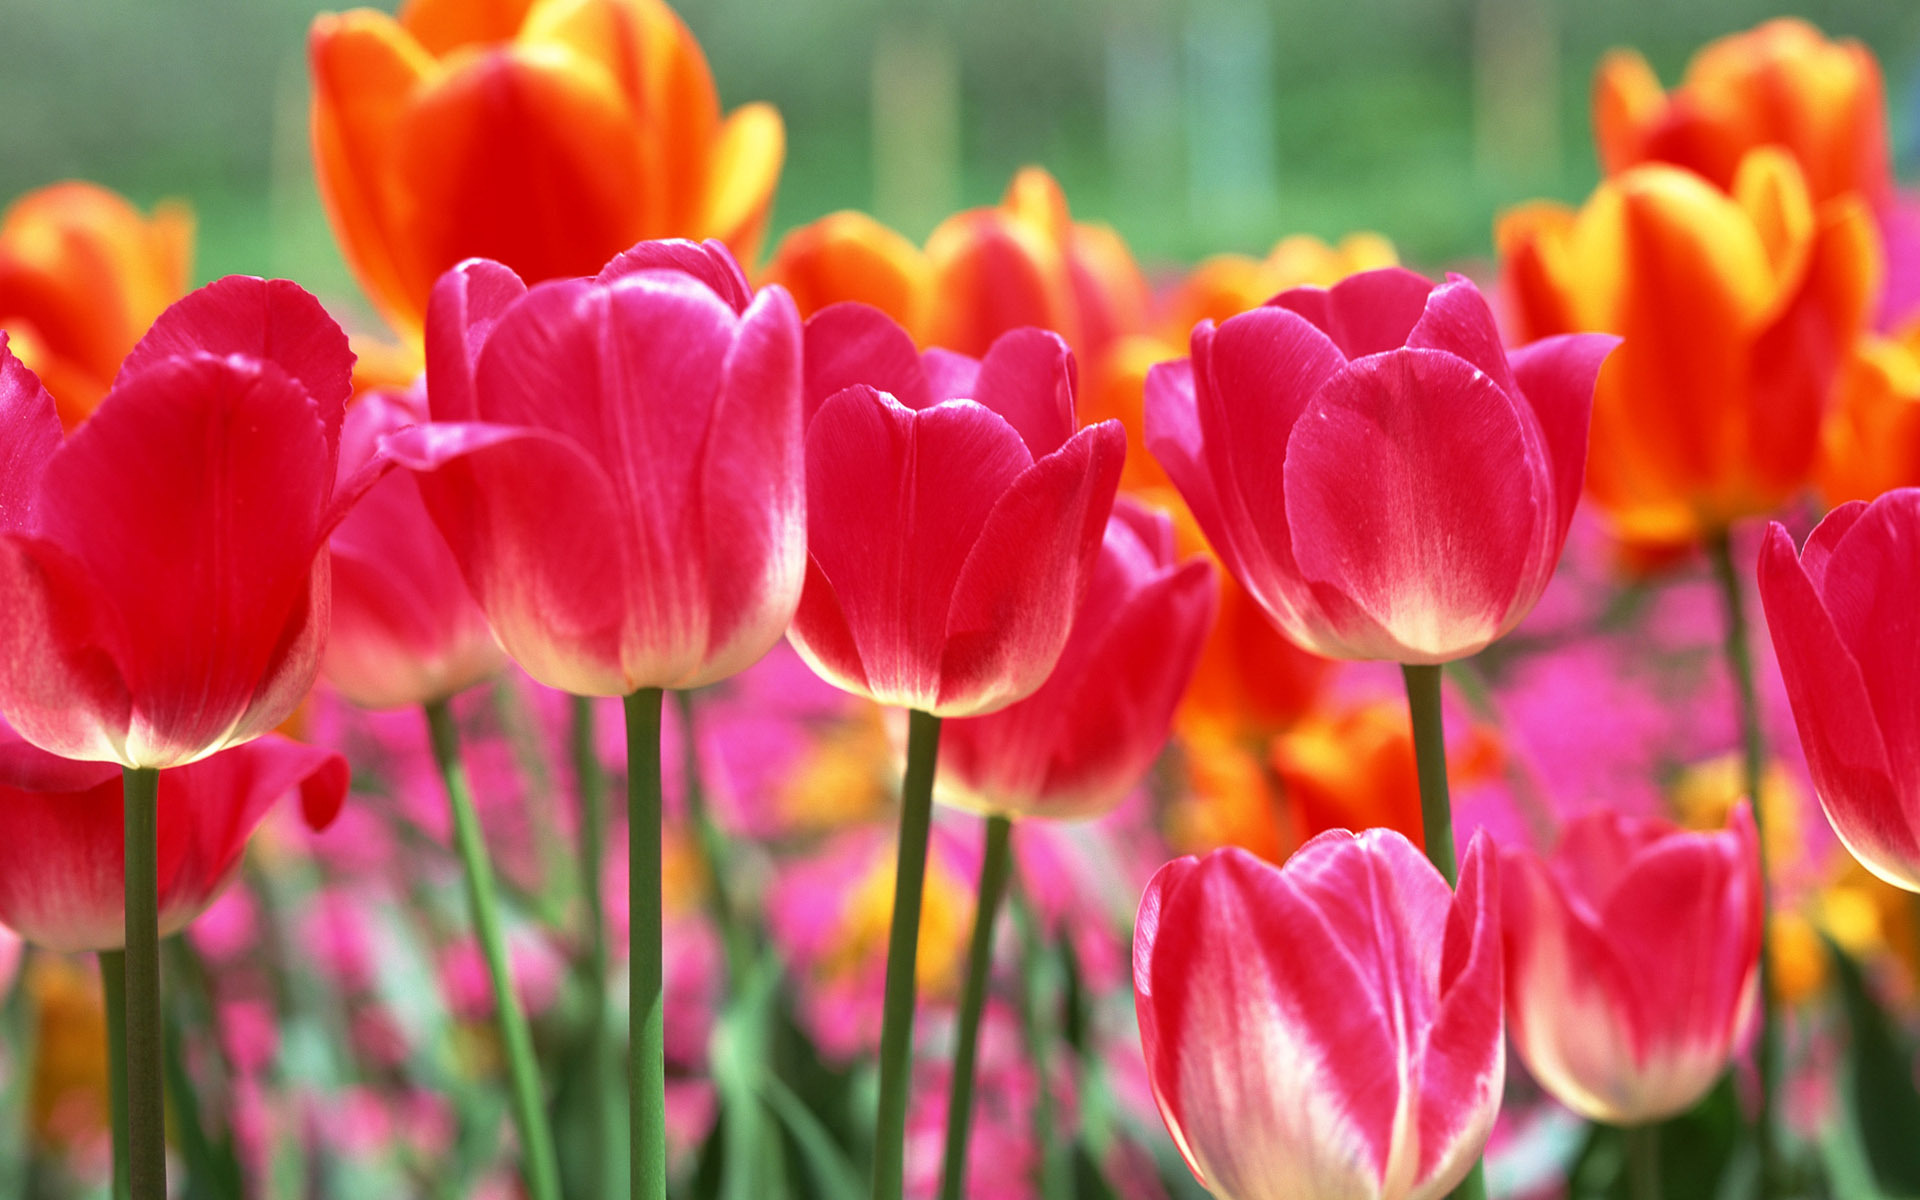 Картинки цветы тюльпаны на рабочий стол, храни тебя бог